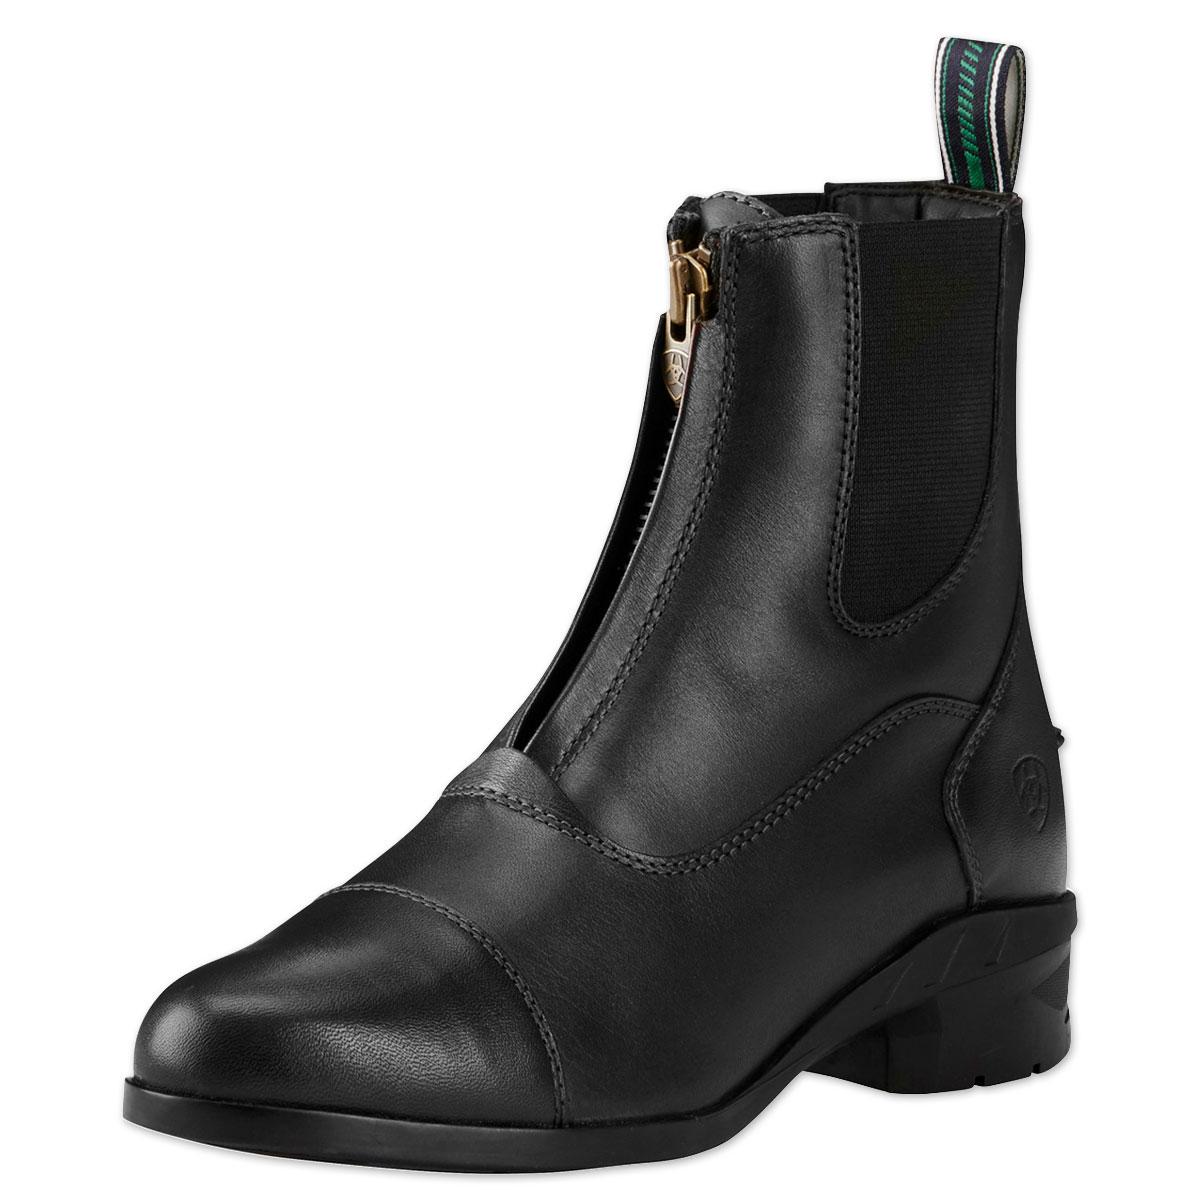 a7df191d02f Ariat Heritage IV Zip Paddock Boot